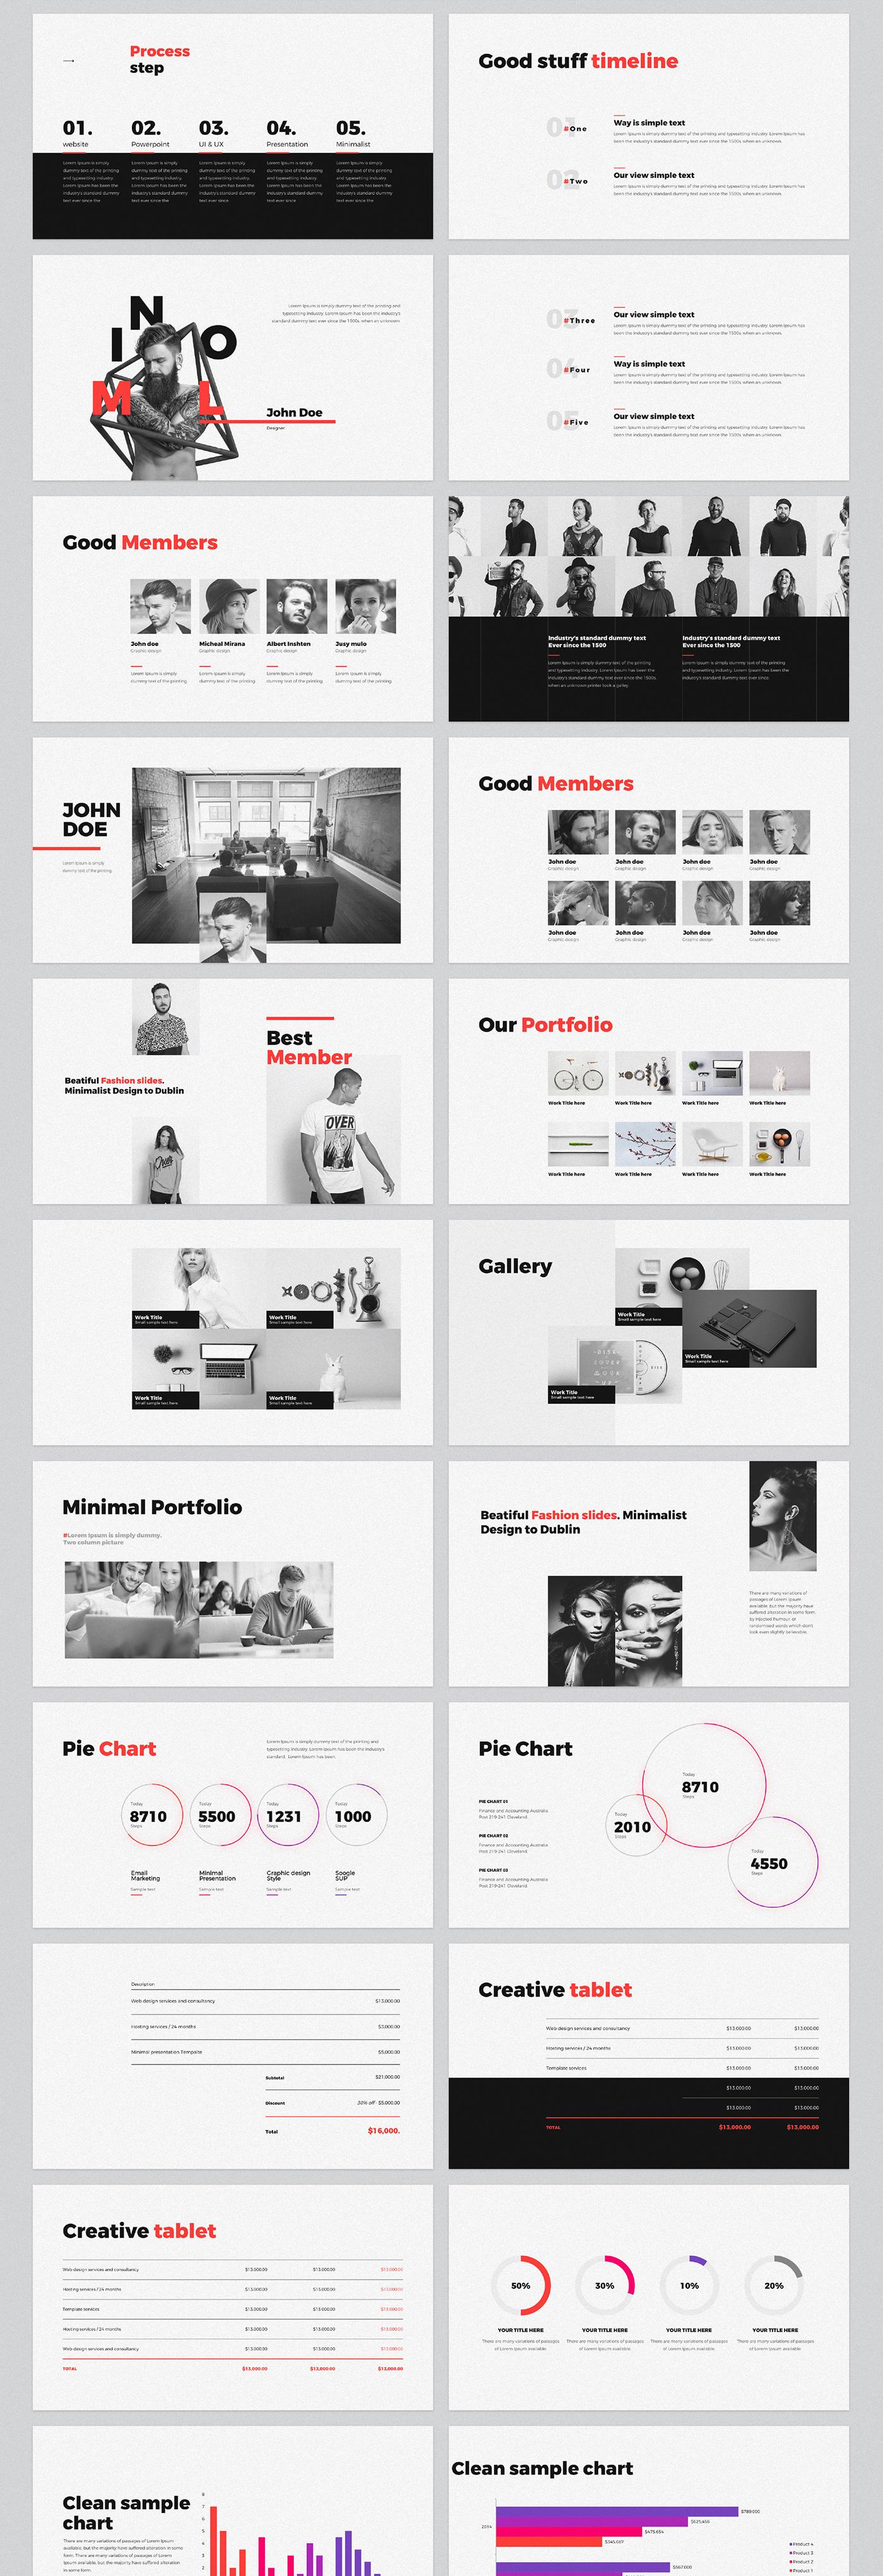 free free powerpoint free keynote free presentation Free Slides free infographic Free Template free design free mockup  free chart